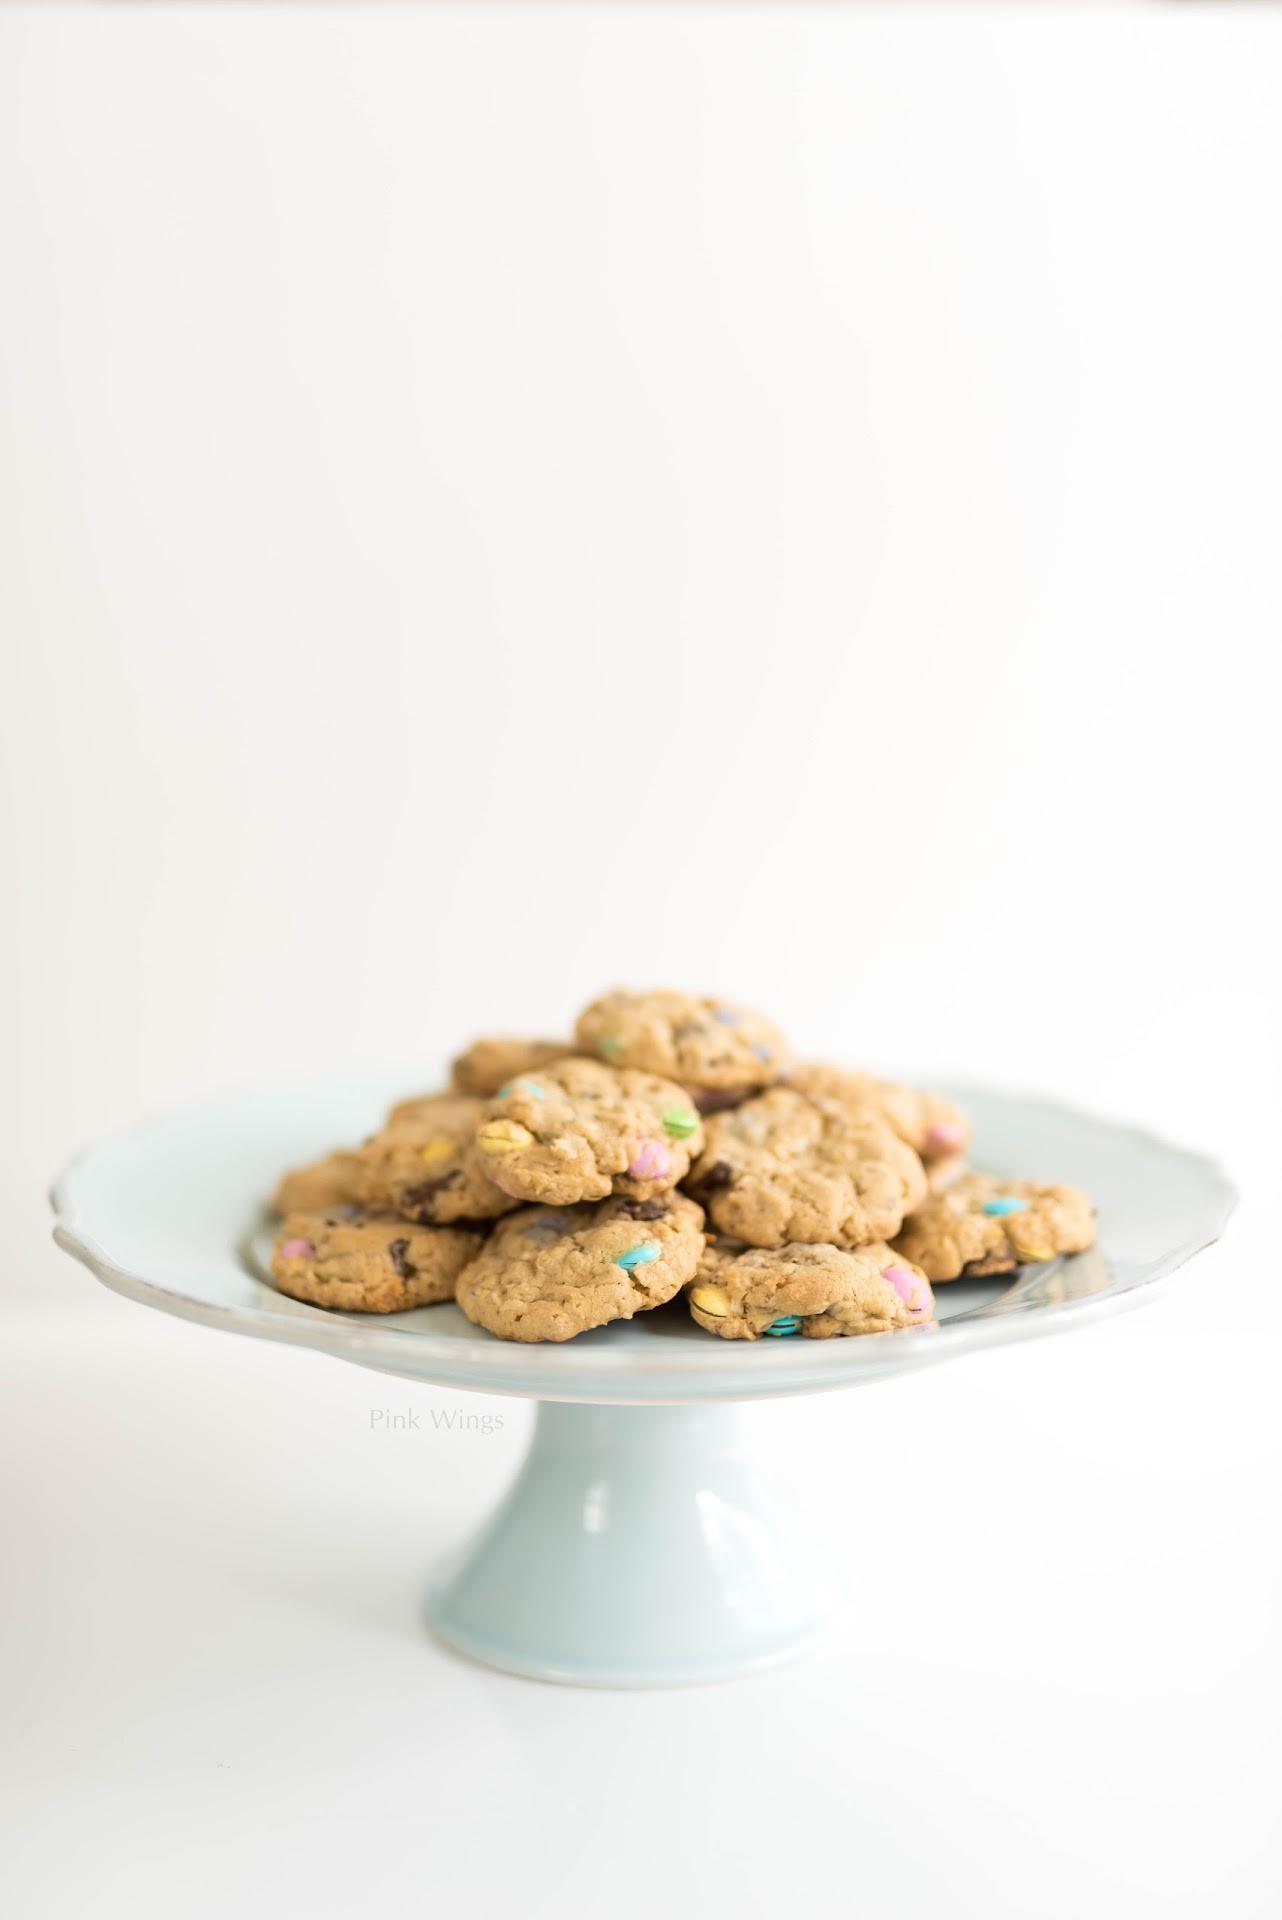 easter dessert recipe, easter cookie recipe, pastel dessert, hawaiian cookie recipe easy, hawaiian dessert recipe, hawaiian cookie recipe, hawaiian chocolate chip cookies,